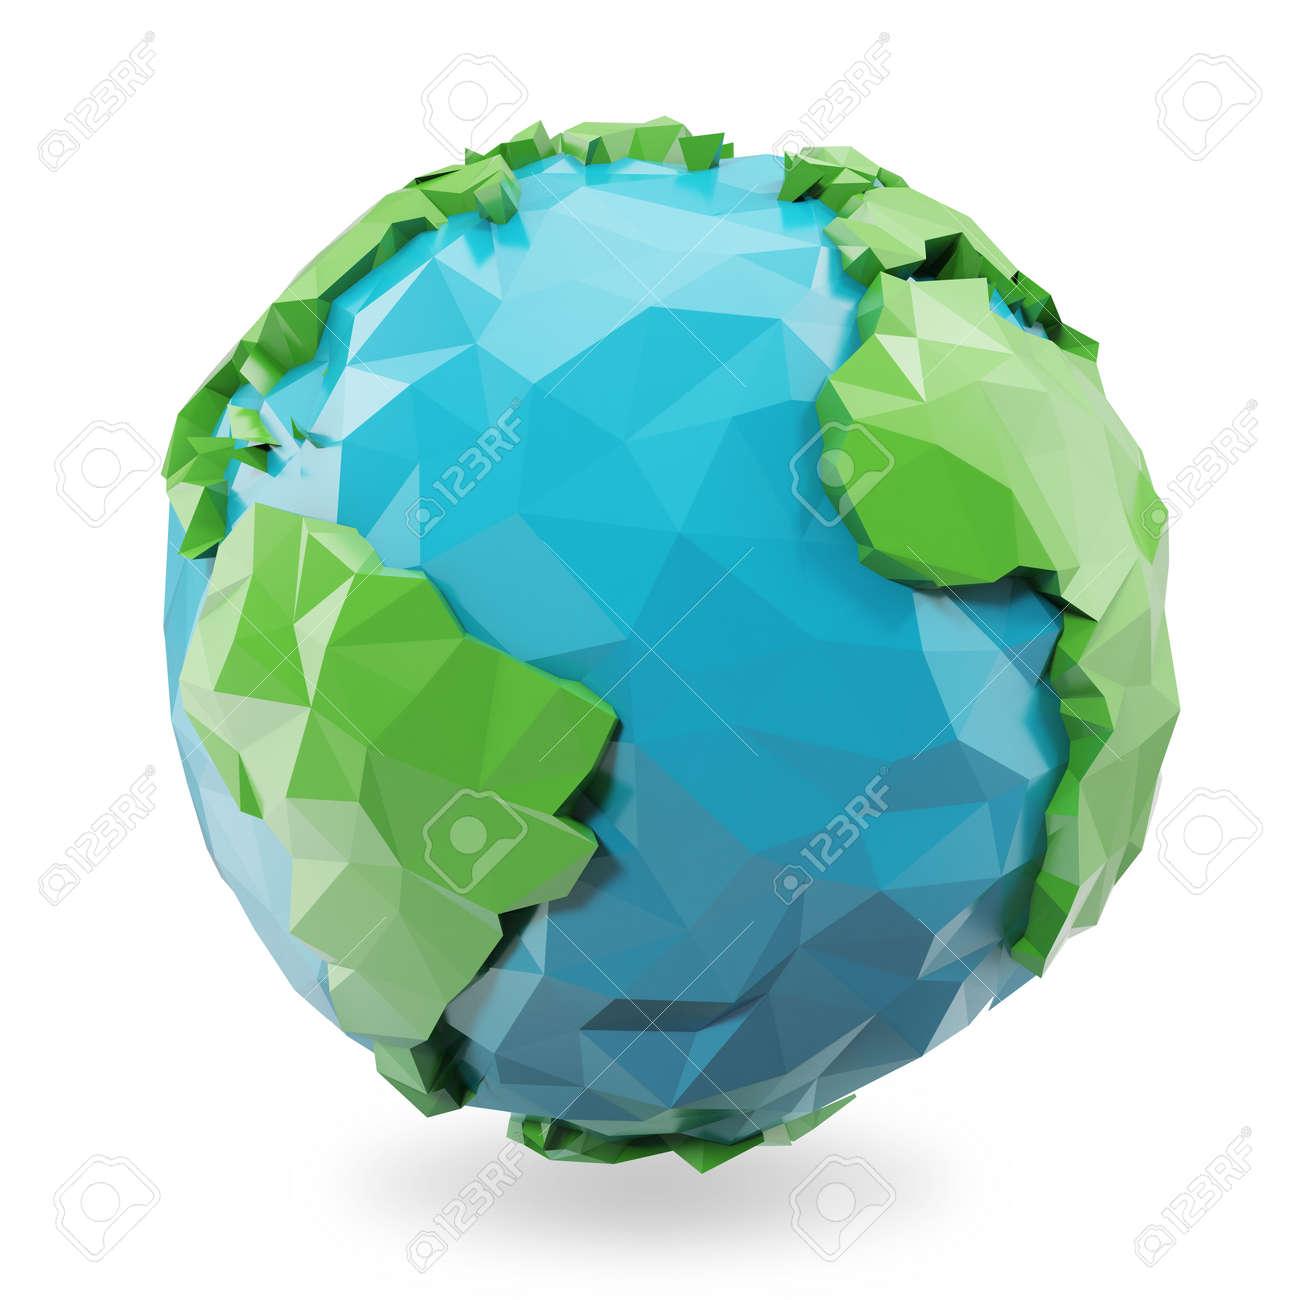 3d rendering low poly earth globe illustration polygonal globe